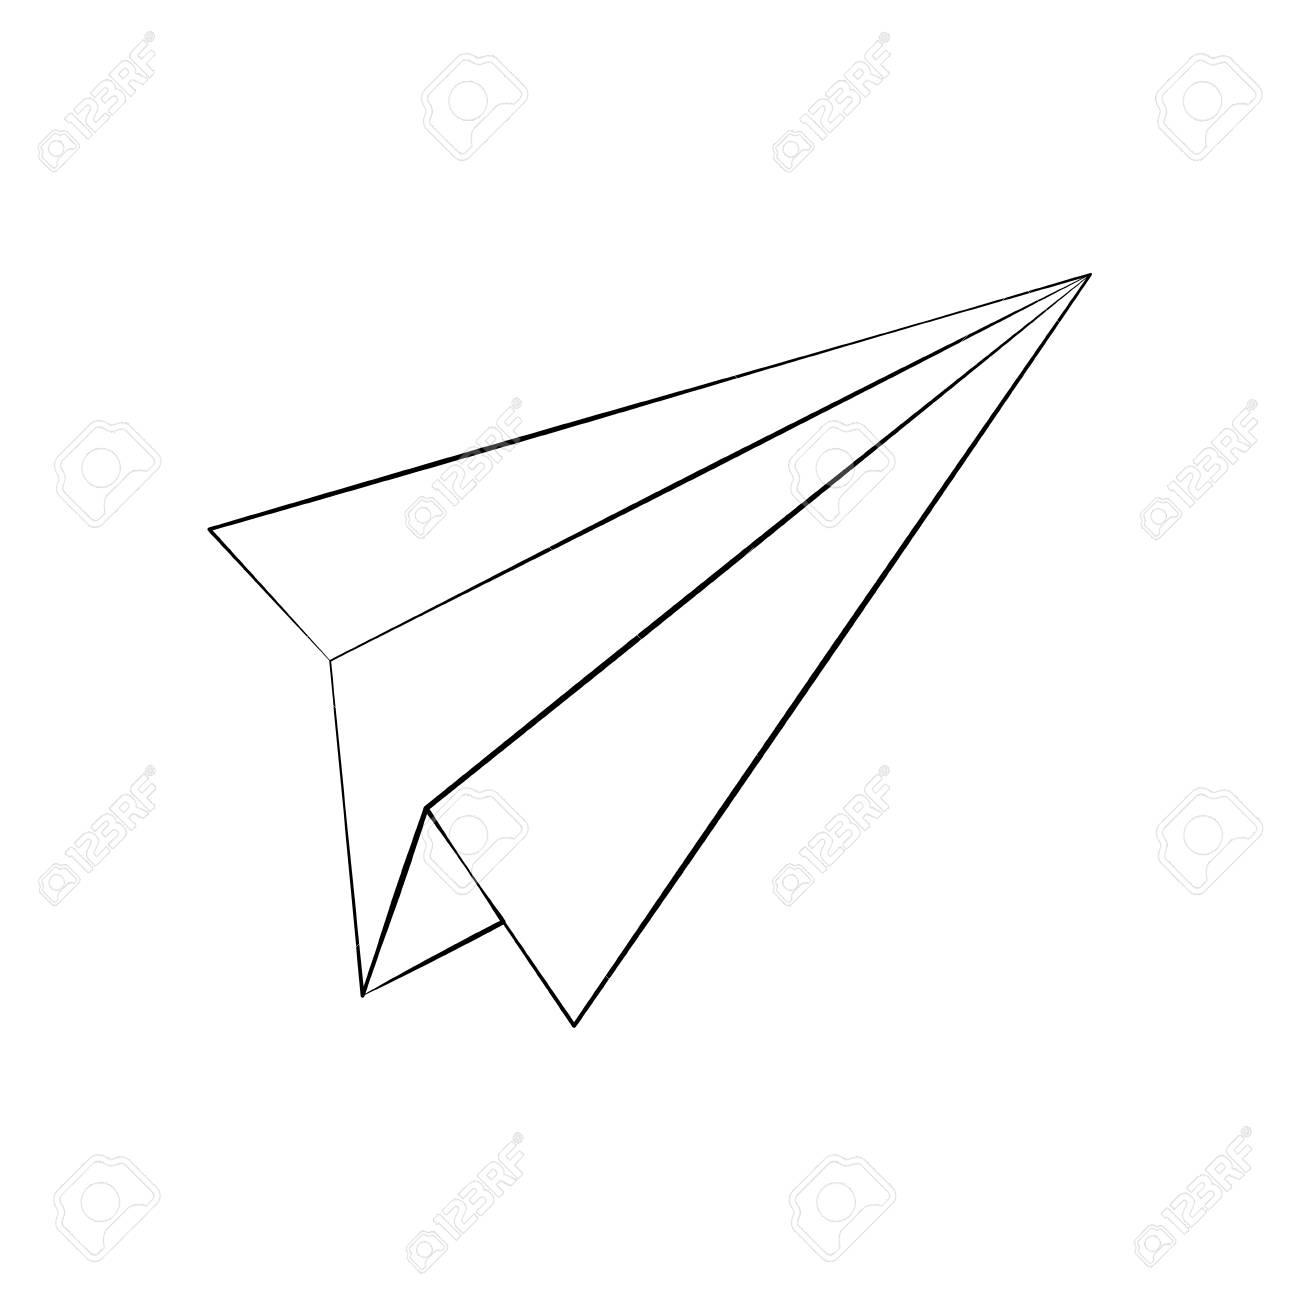 1300x1300 Paper Plane Draw Icon Vector Illustration Graphic Design Royalty